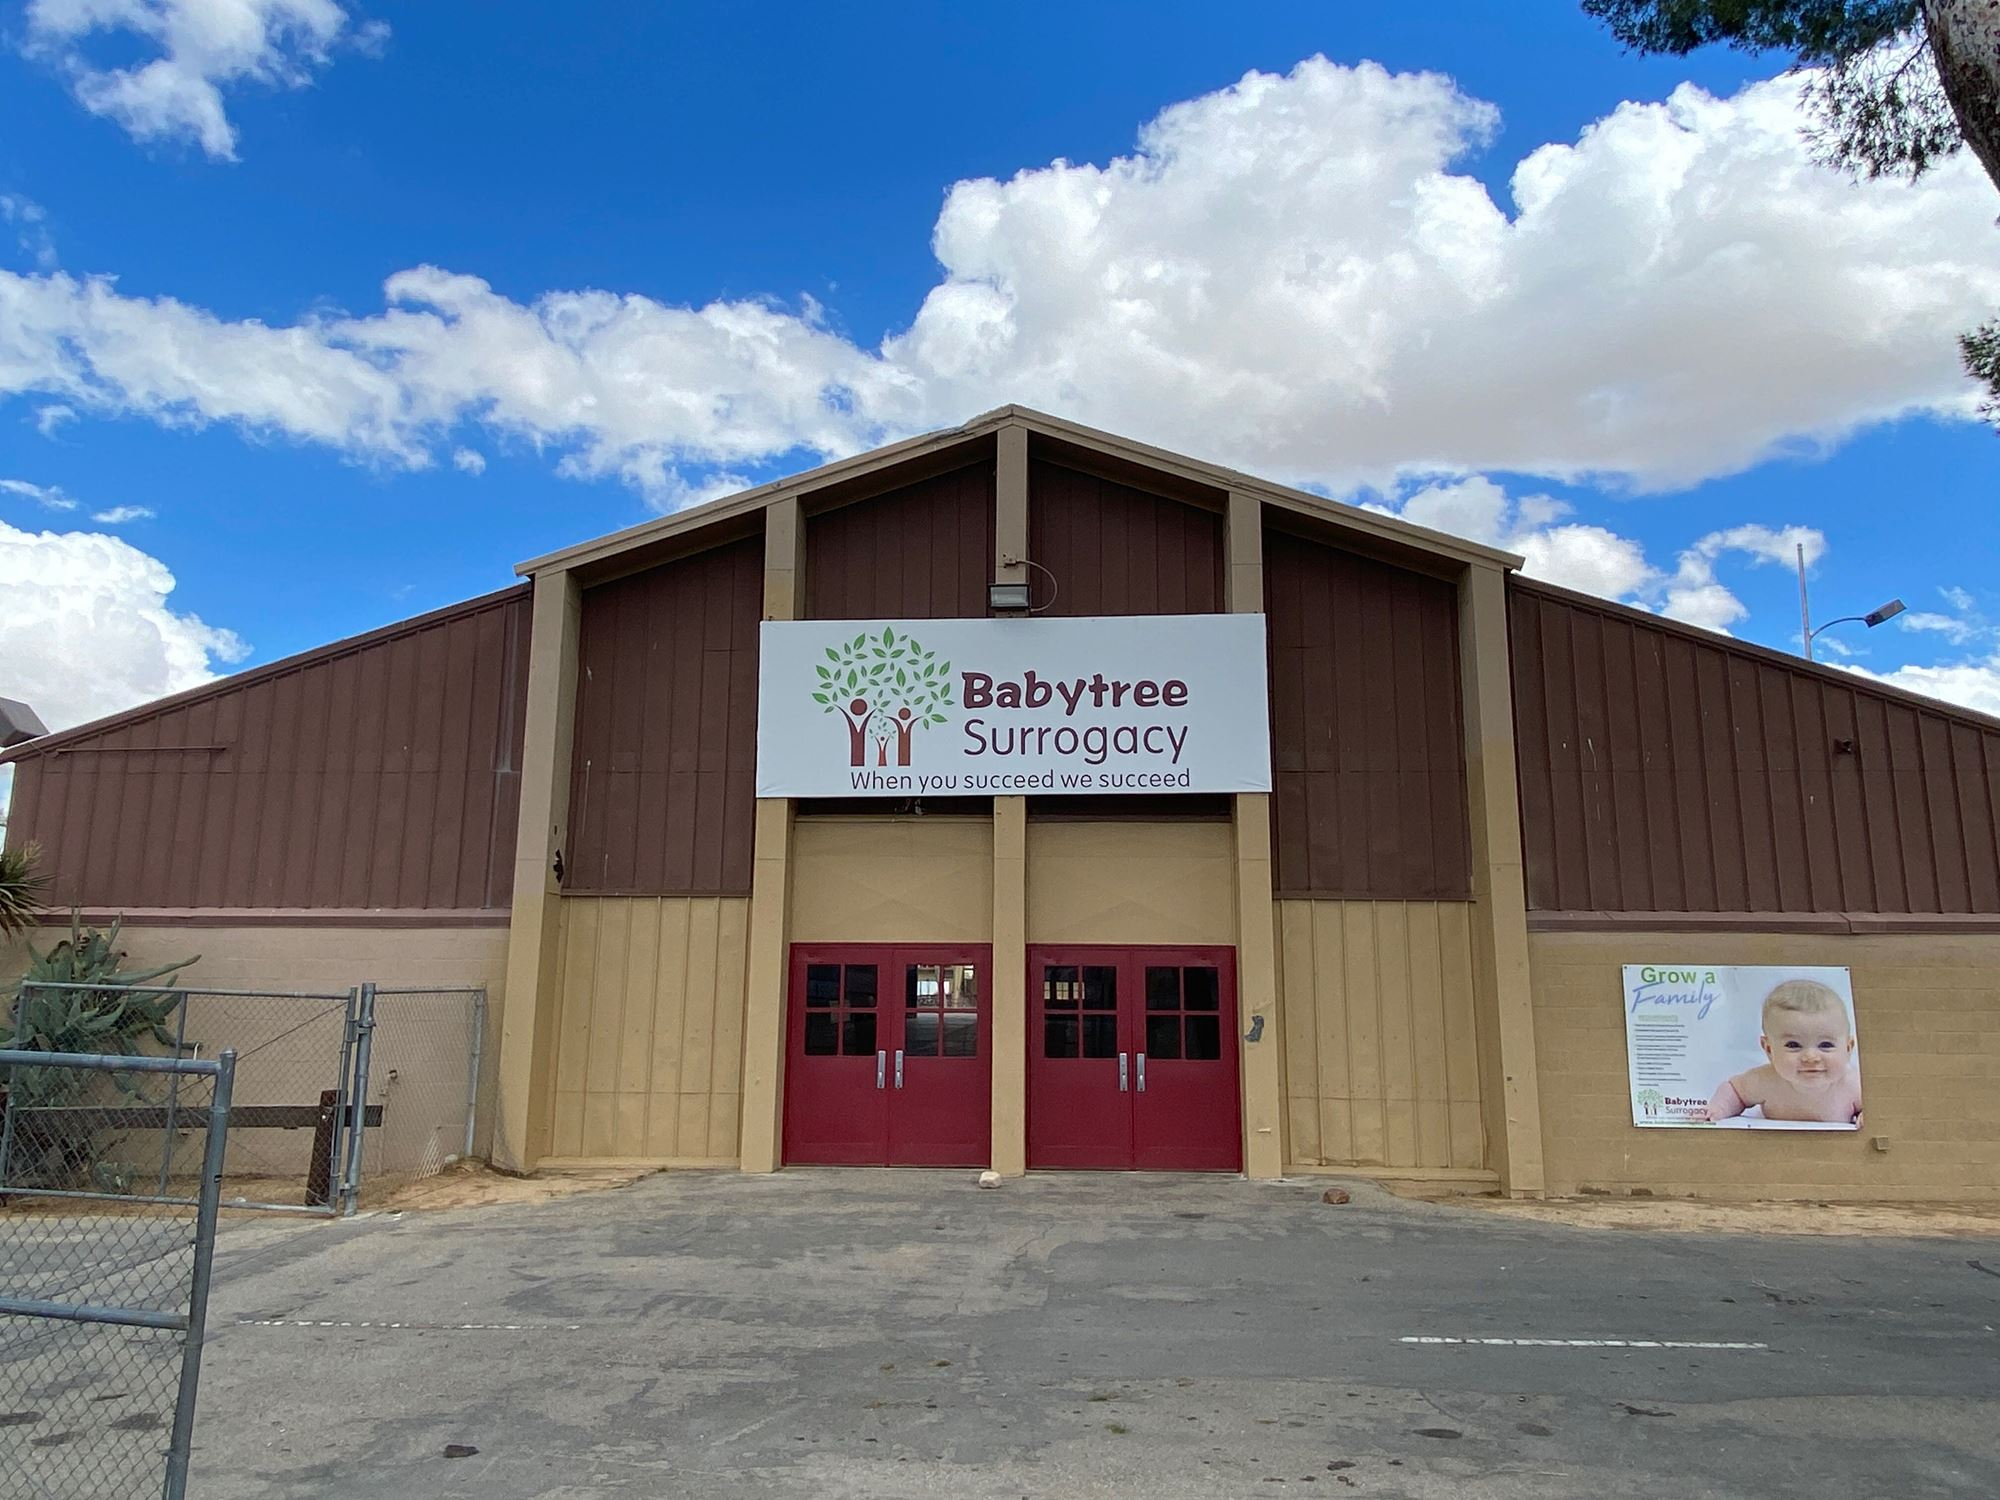 Babytree Surrogacy (Building 1)